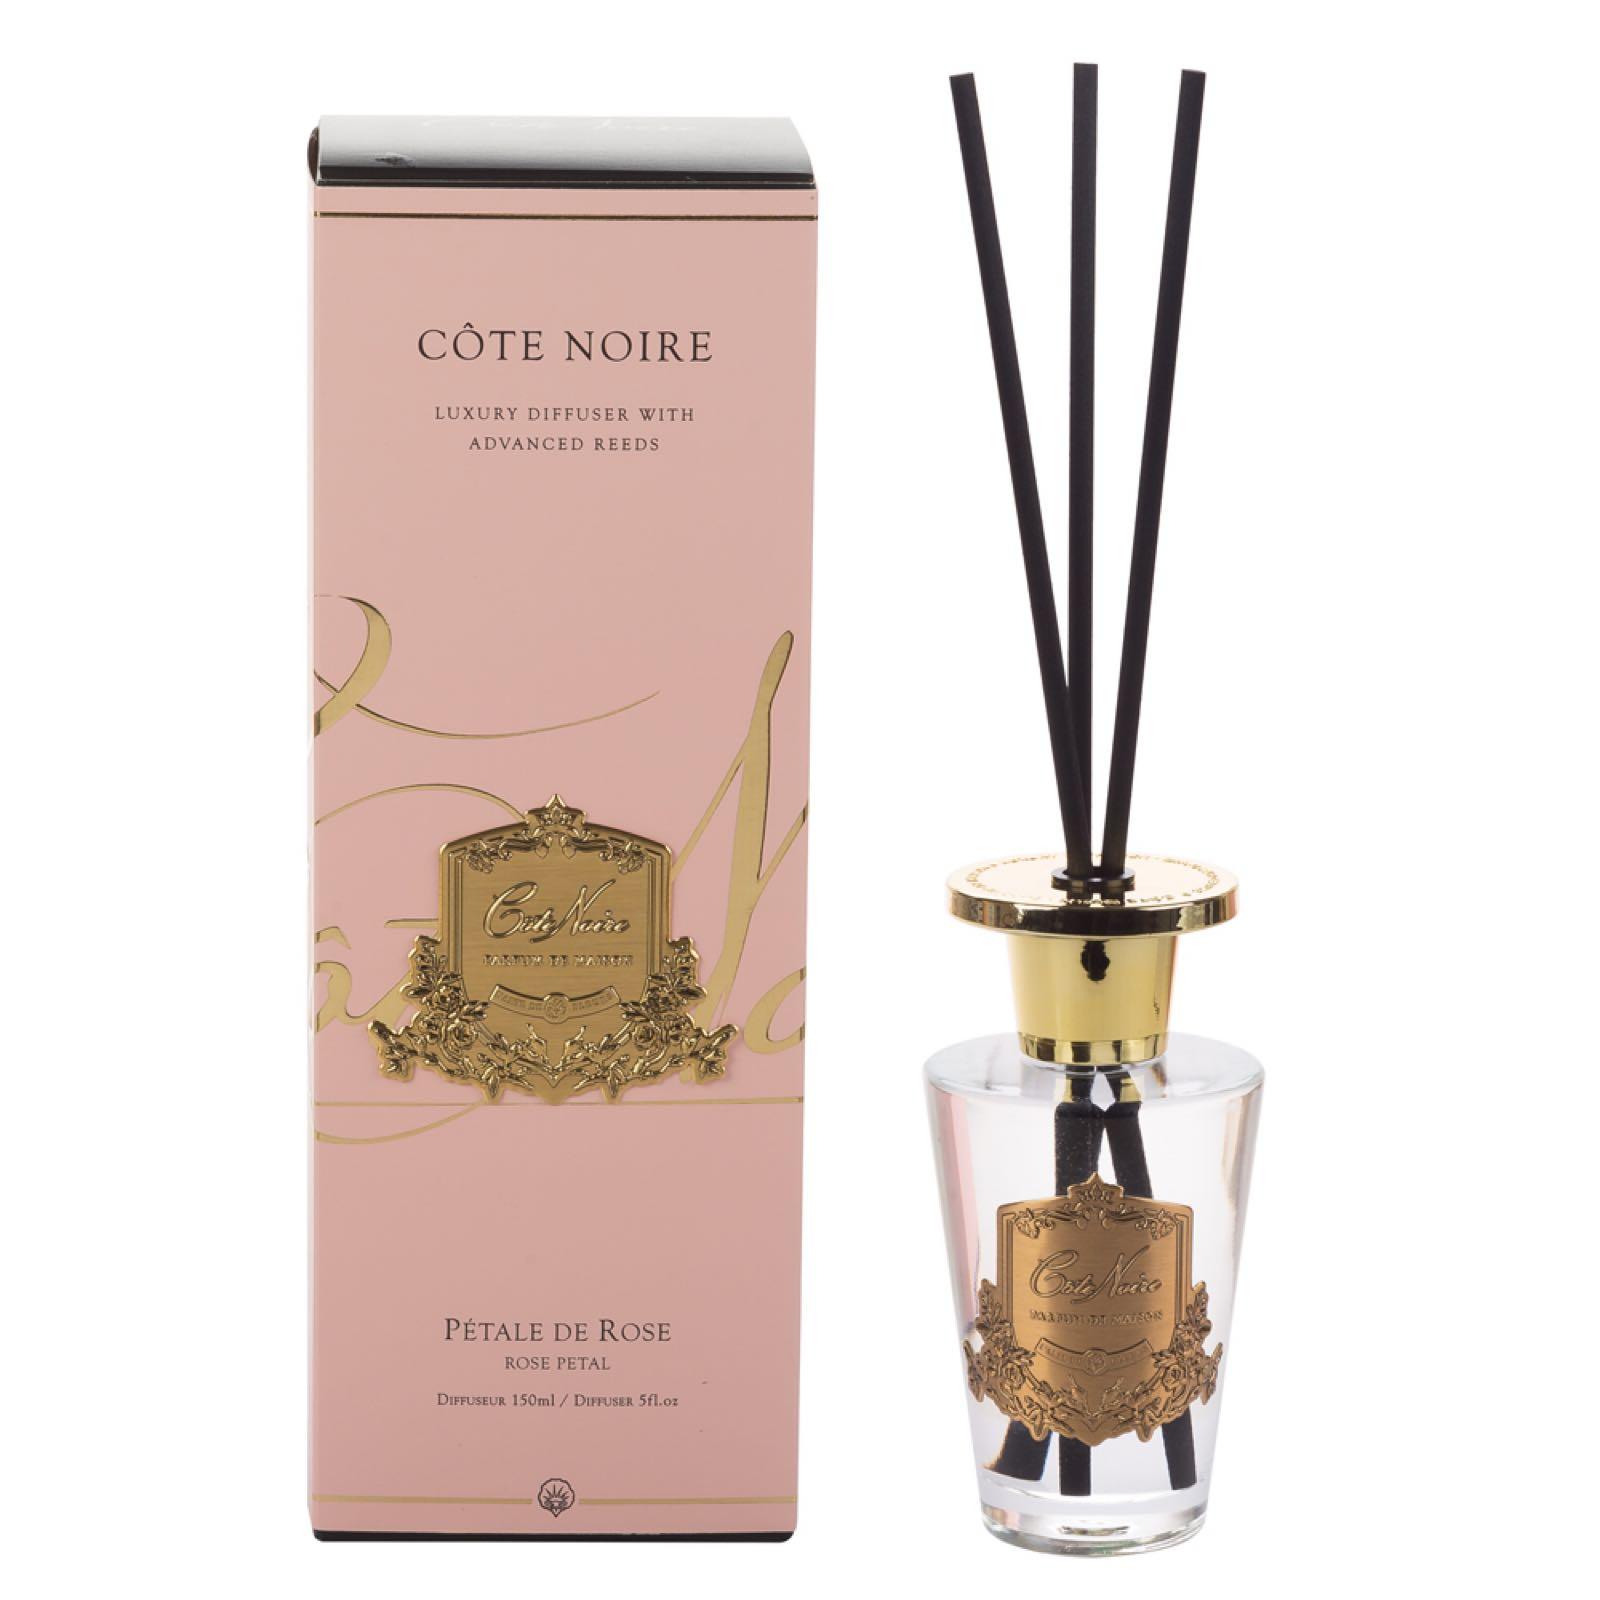 Cote noire rose petal luxury reed diffuser